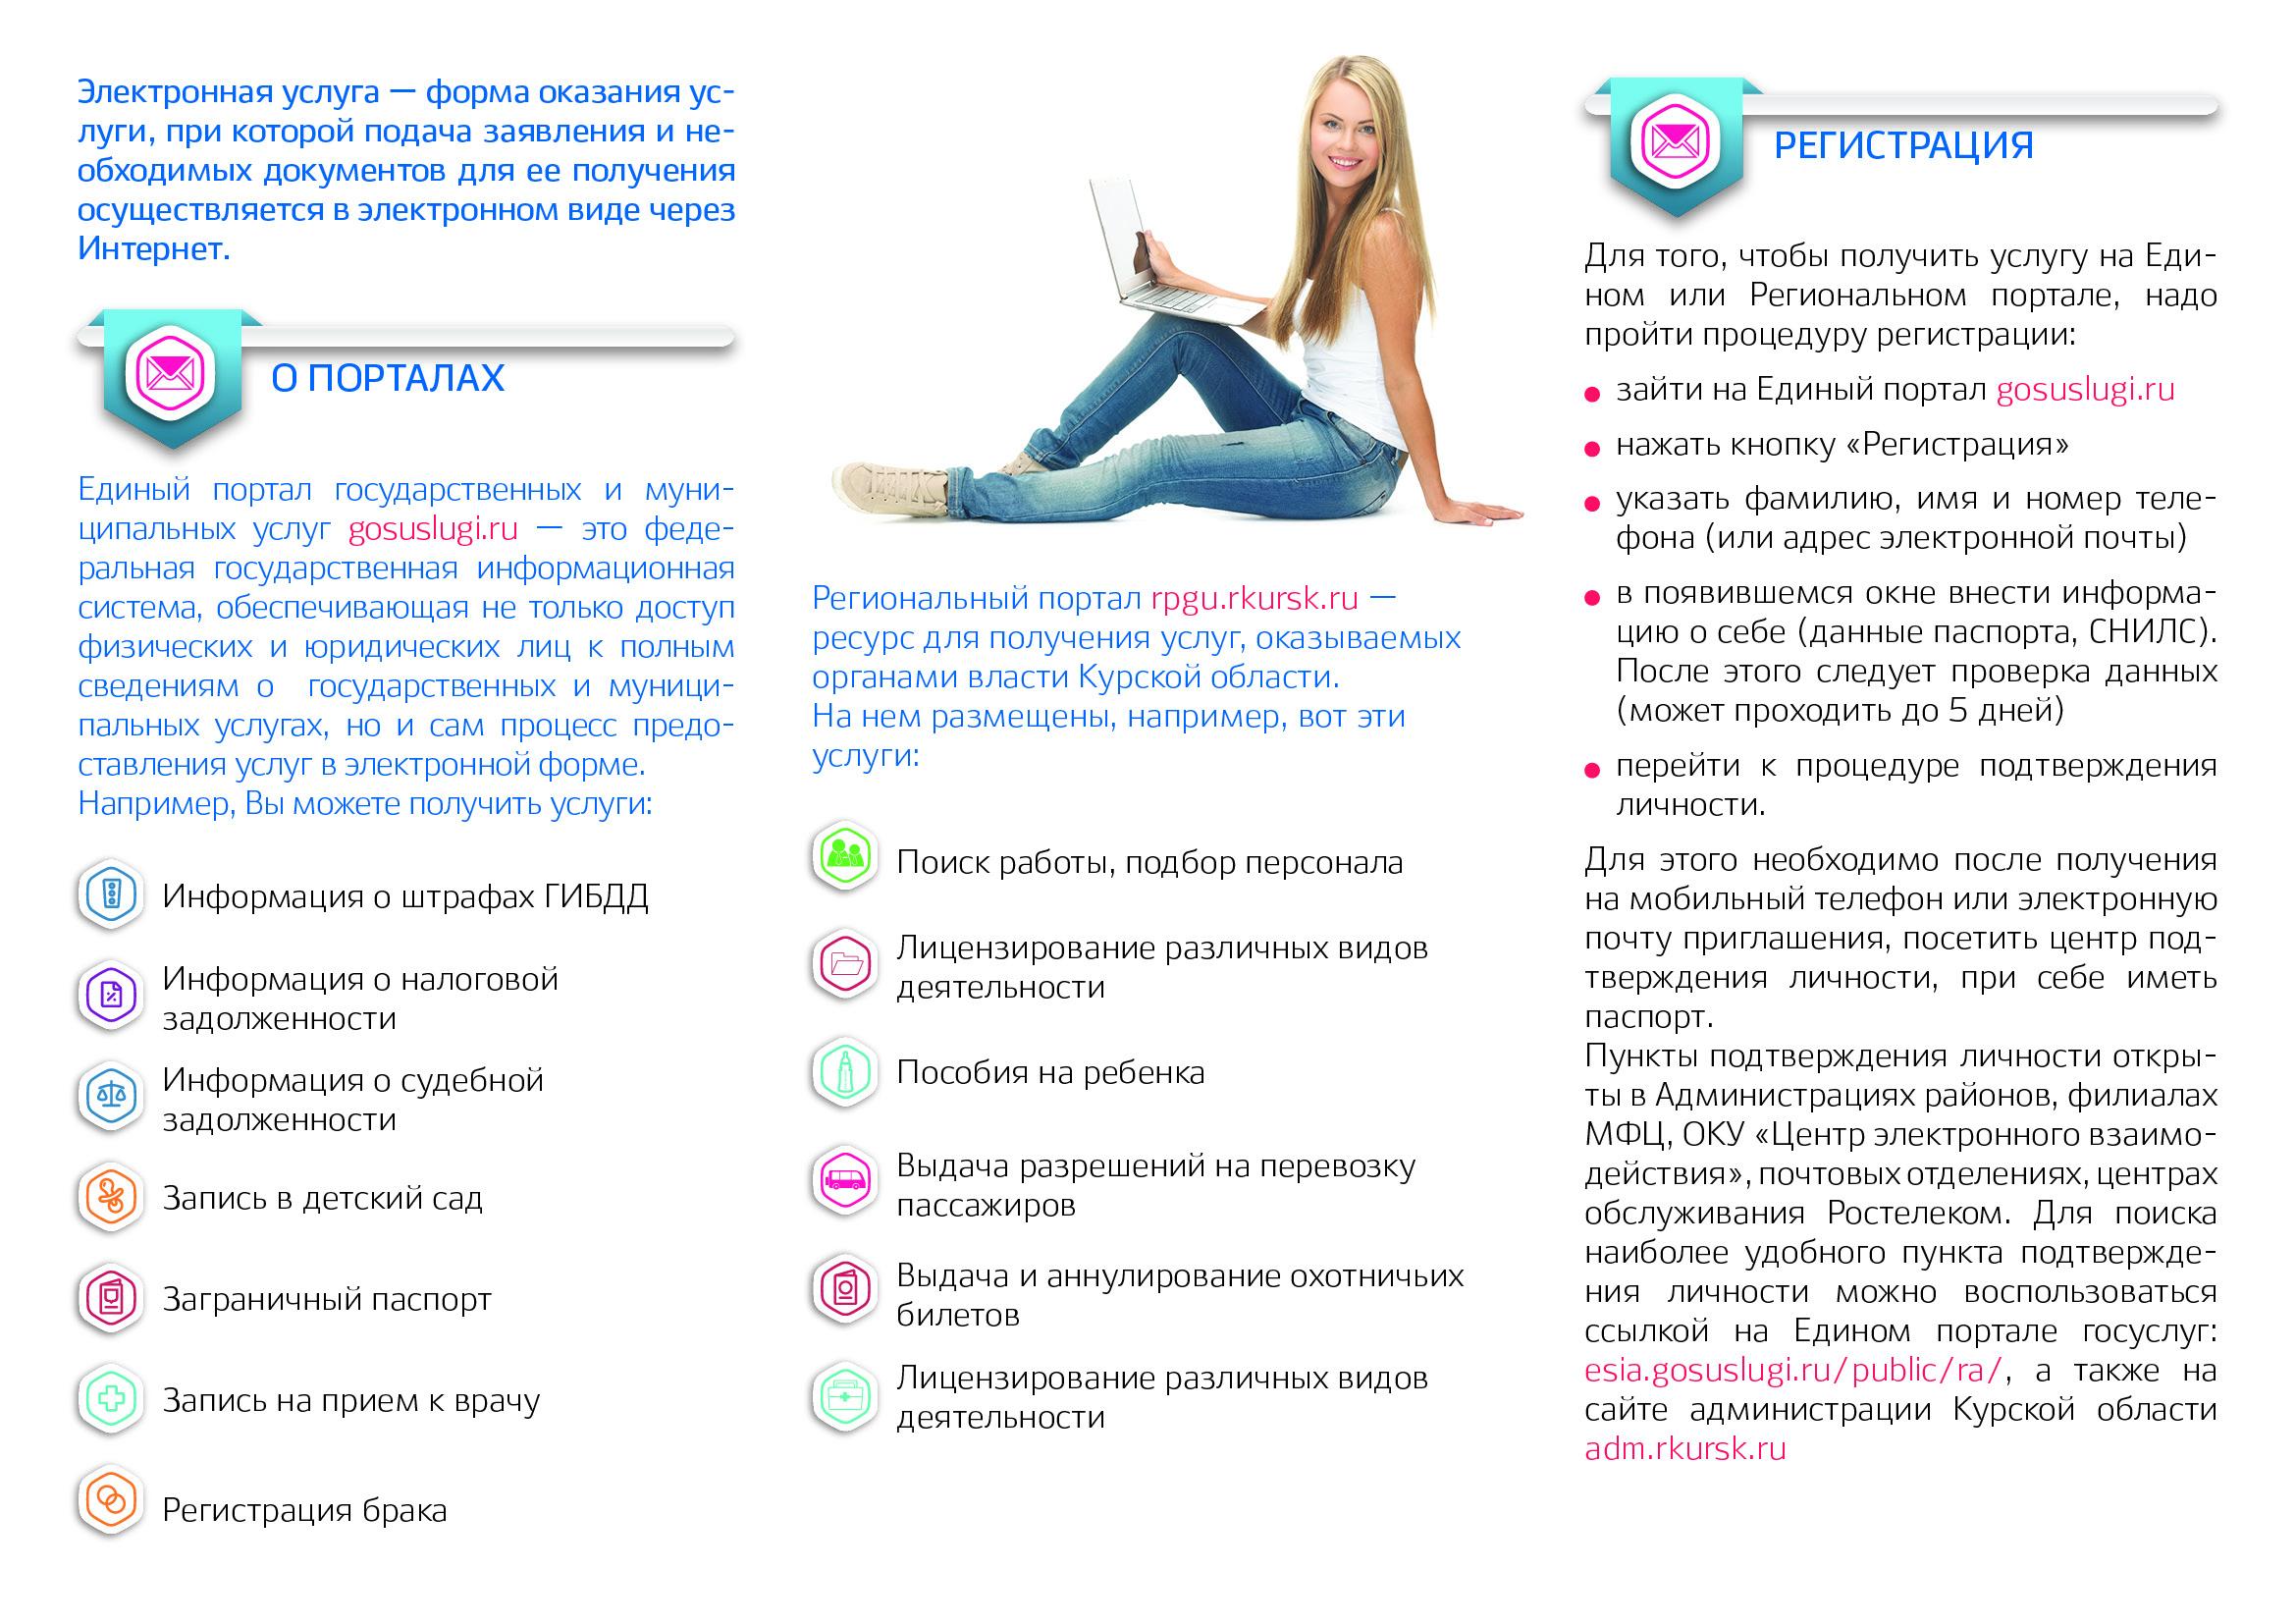 http://vyazovoe.rkursk.ru/files/150776.jpg